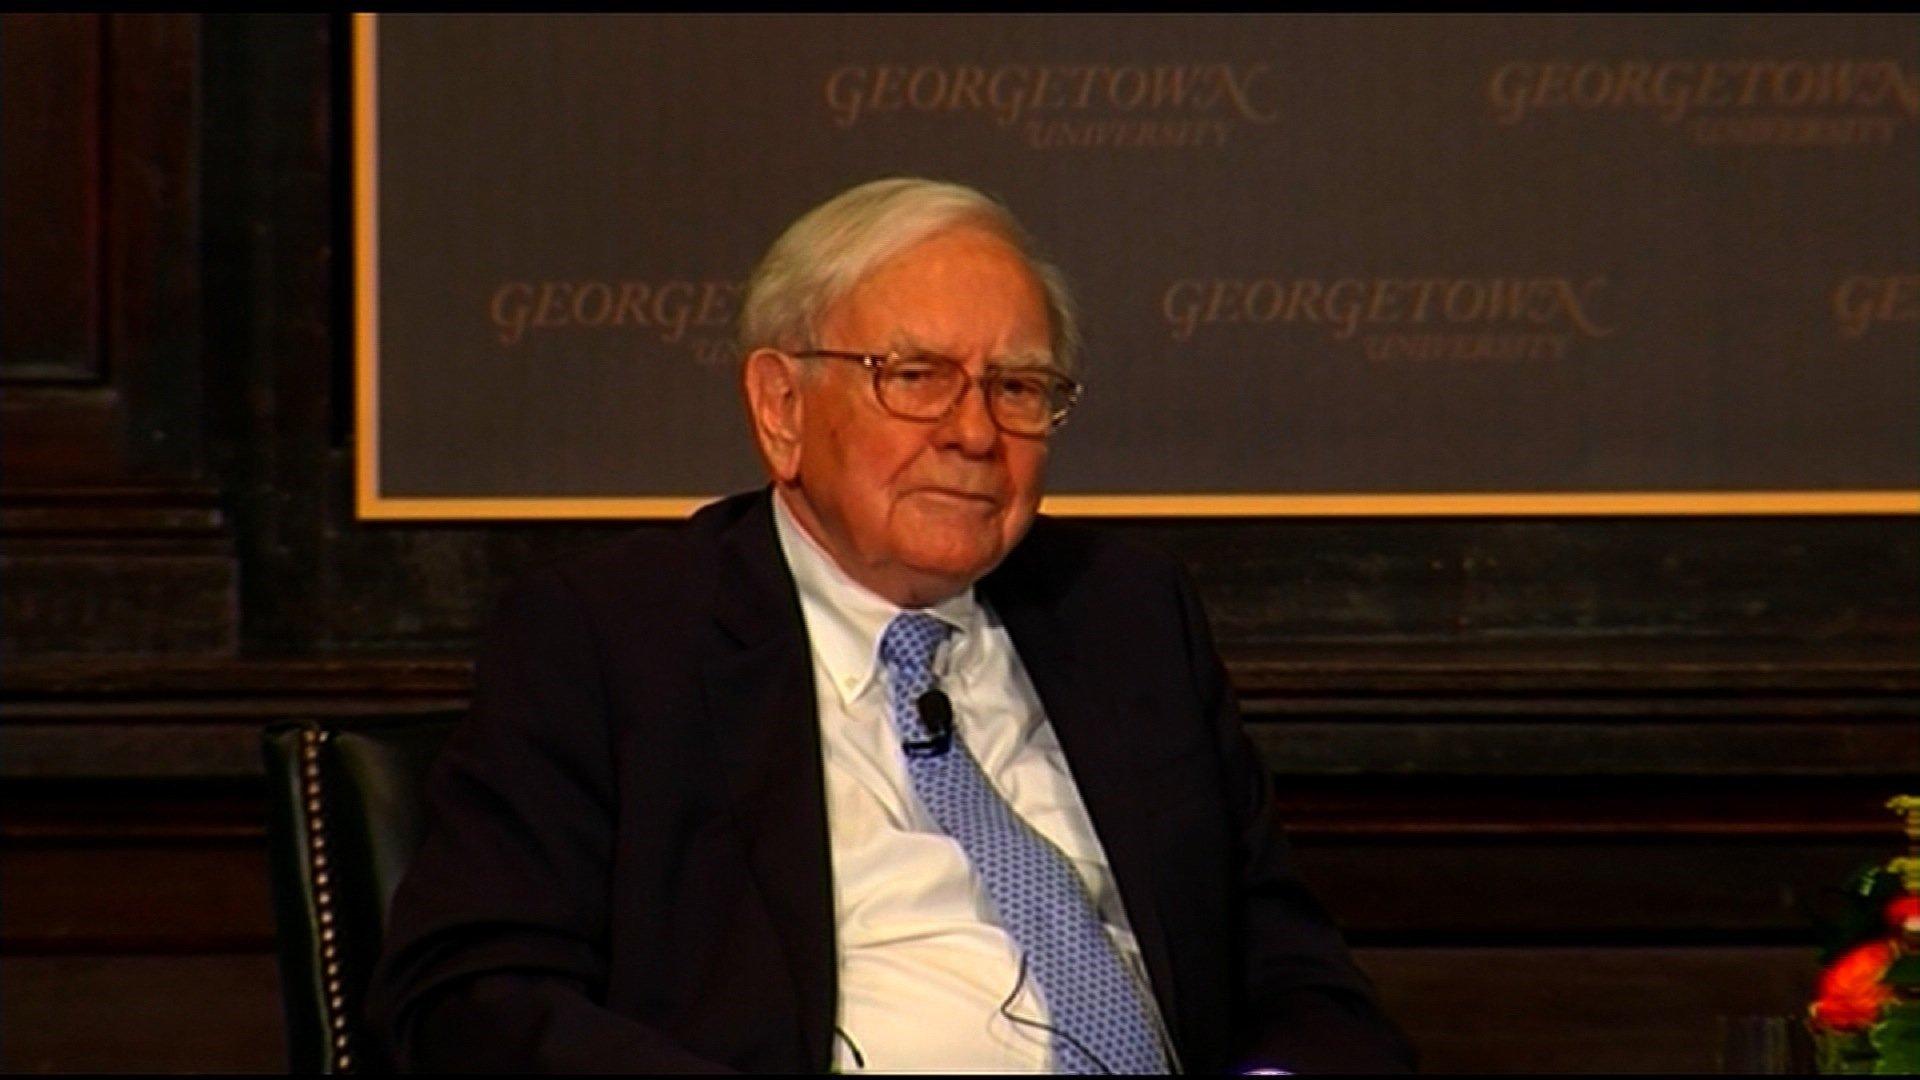 Buffett says Trump wrong on his taxes